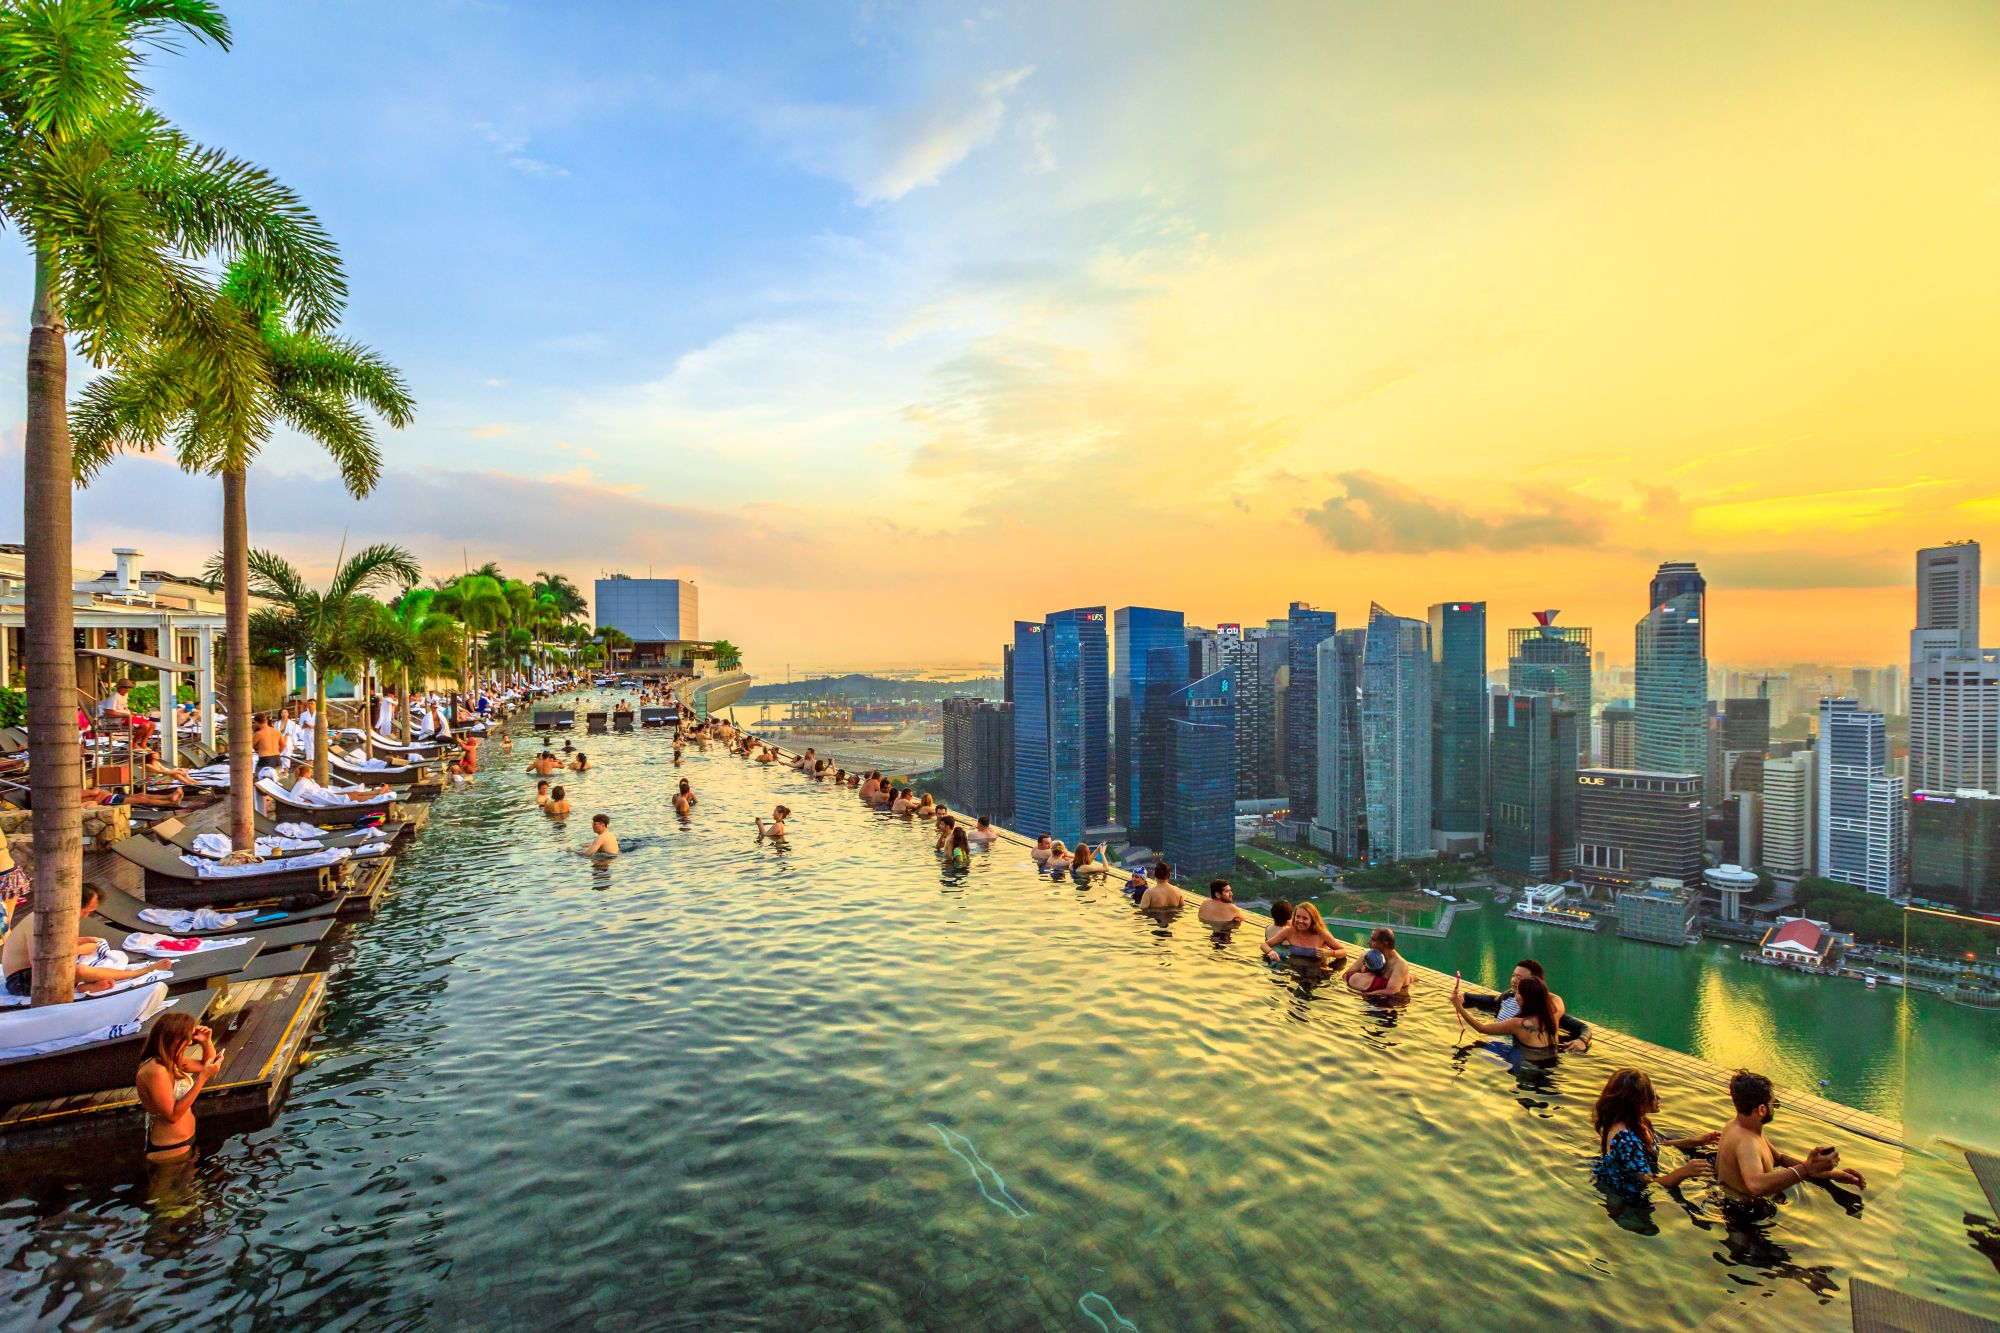 Singapore Infinity Pool Marina Bay Sands hotel